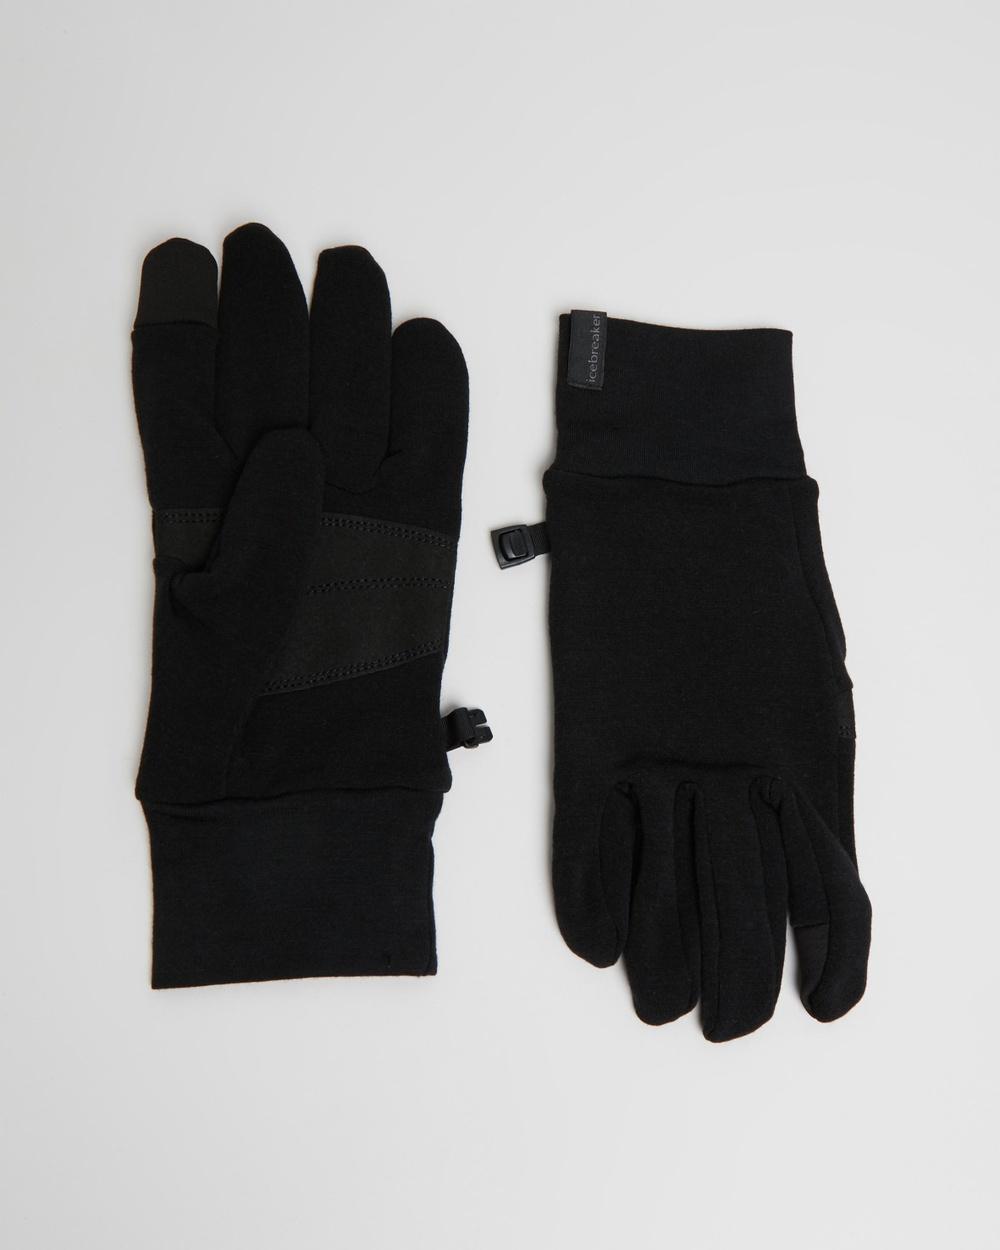 Icebreaker Sierra Gloves Outdoor Black